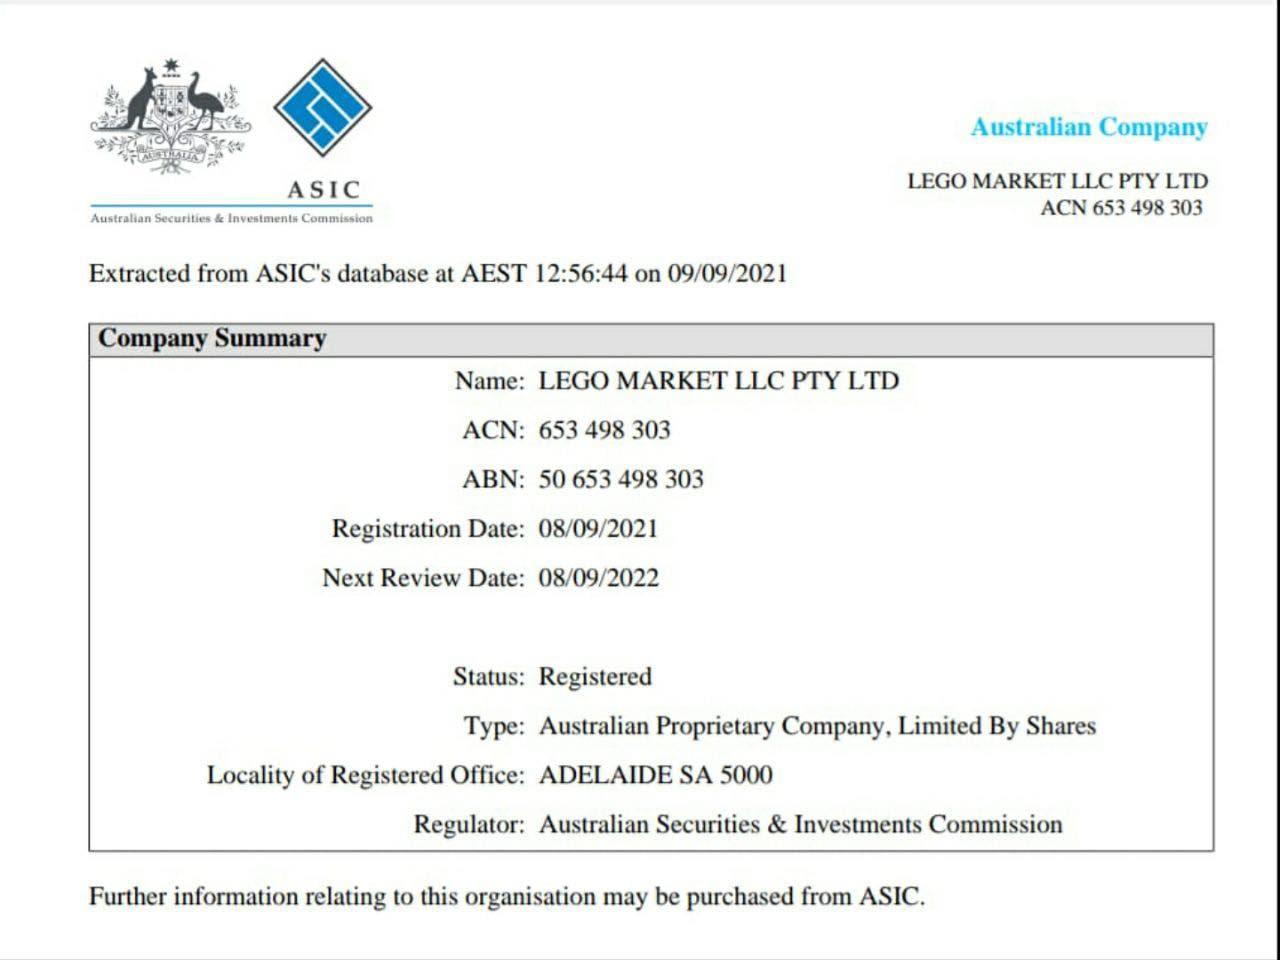 https://www.ateuzleted.hu/wp-content/uploads/2021/09/Certificate.jpg